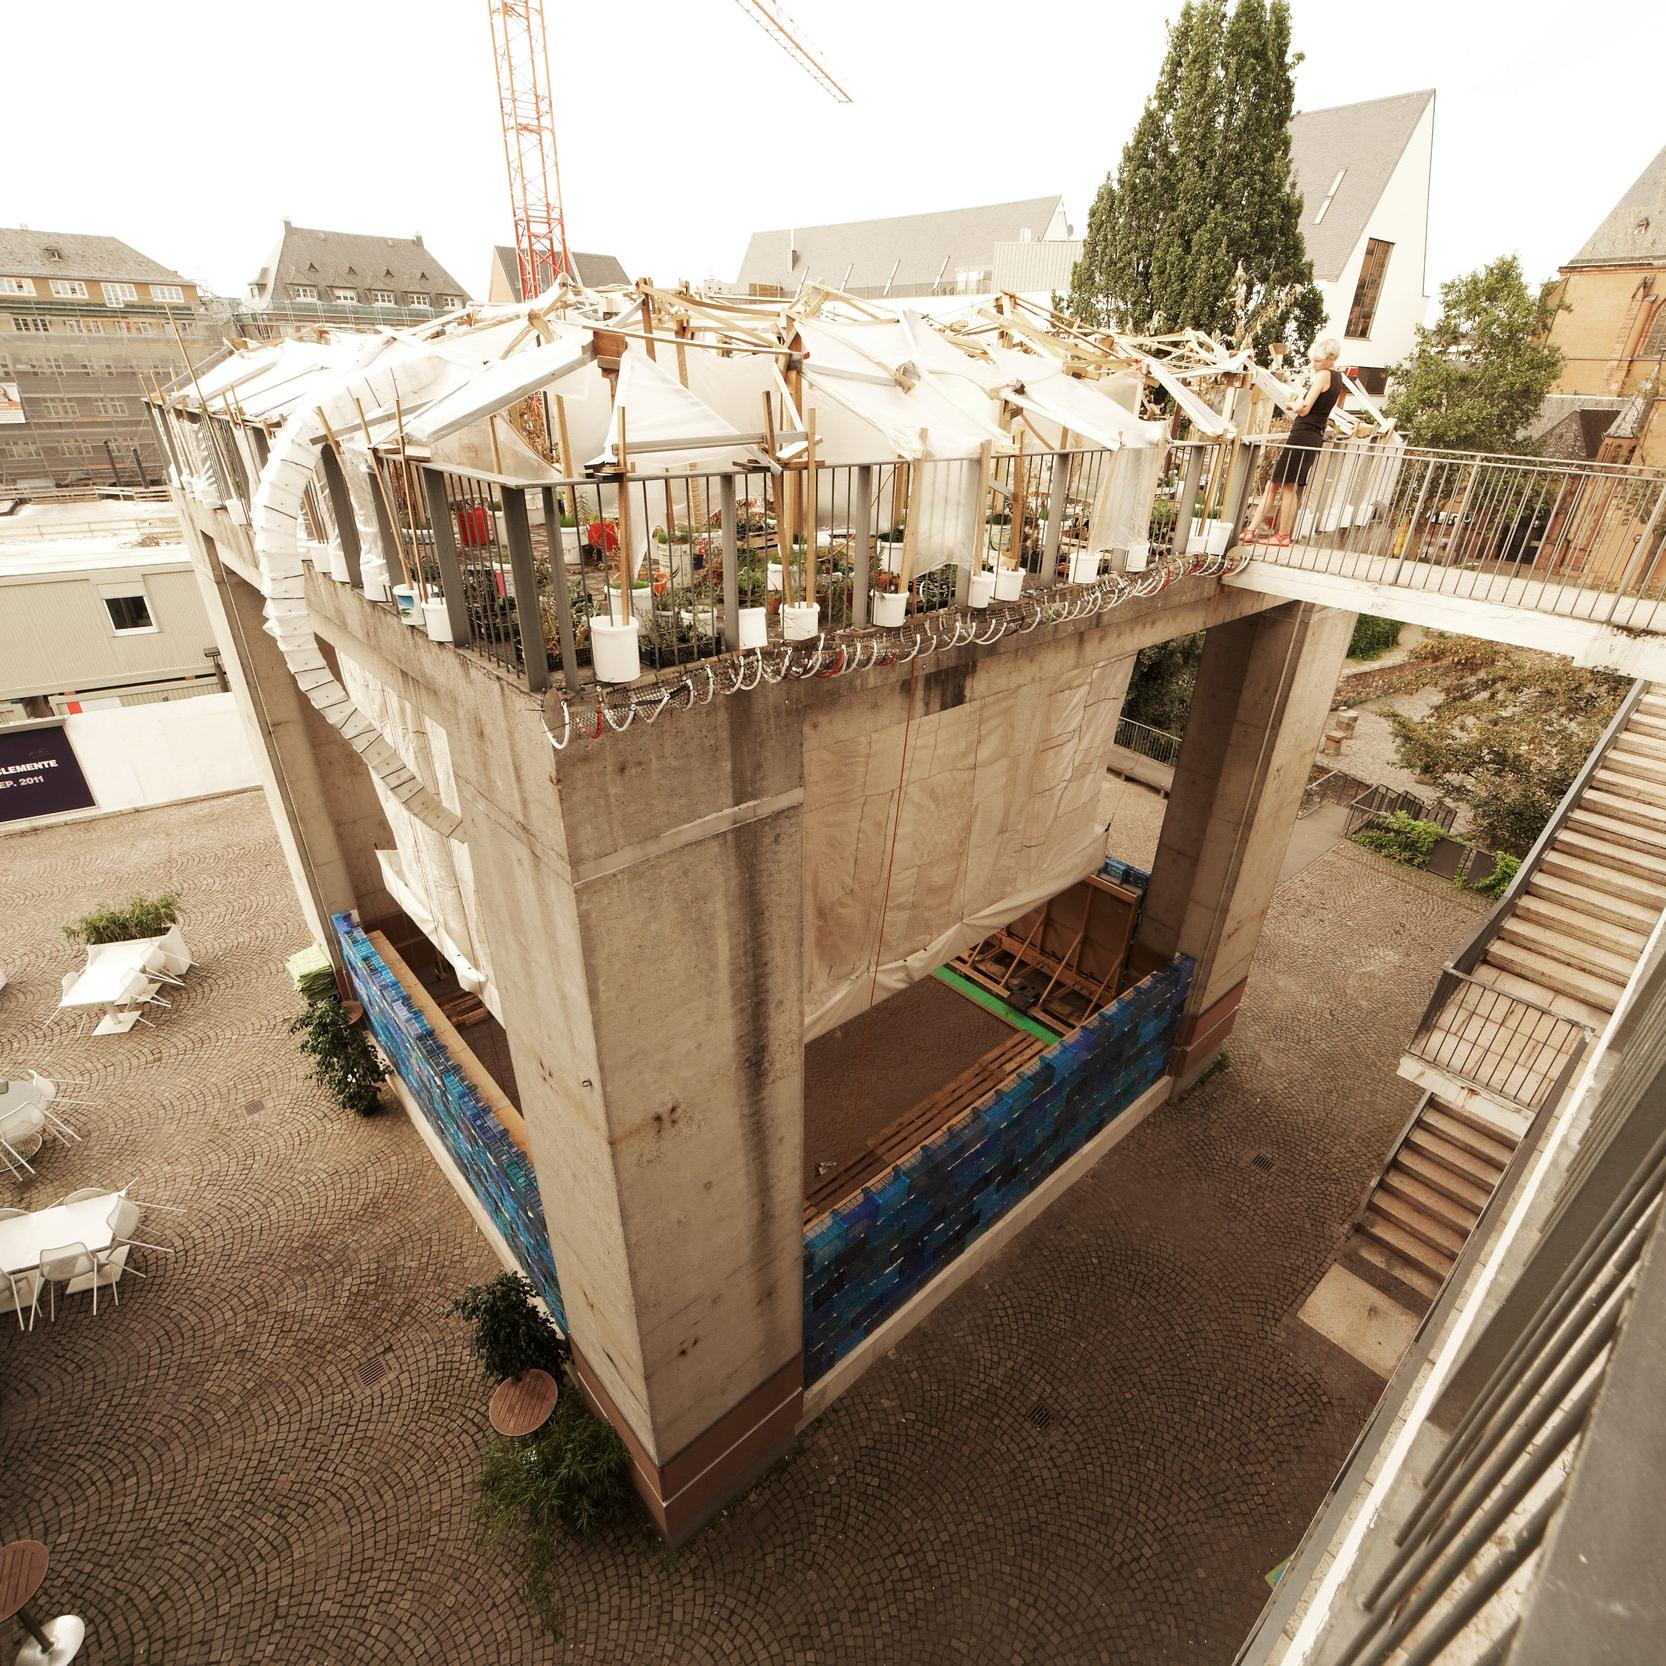 House with Metabolism    Schirn Kunsthalle Frankfurt